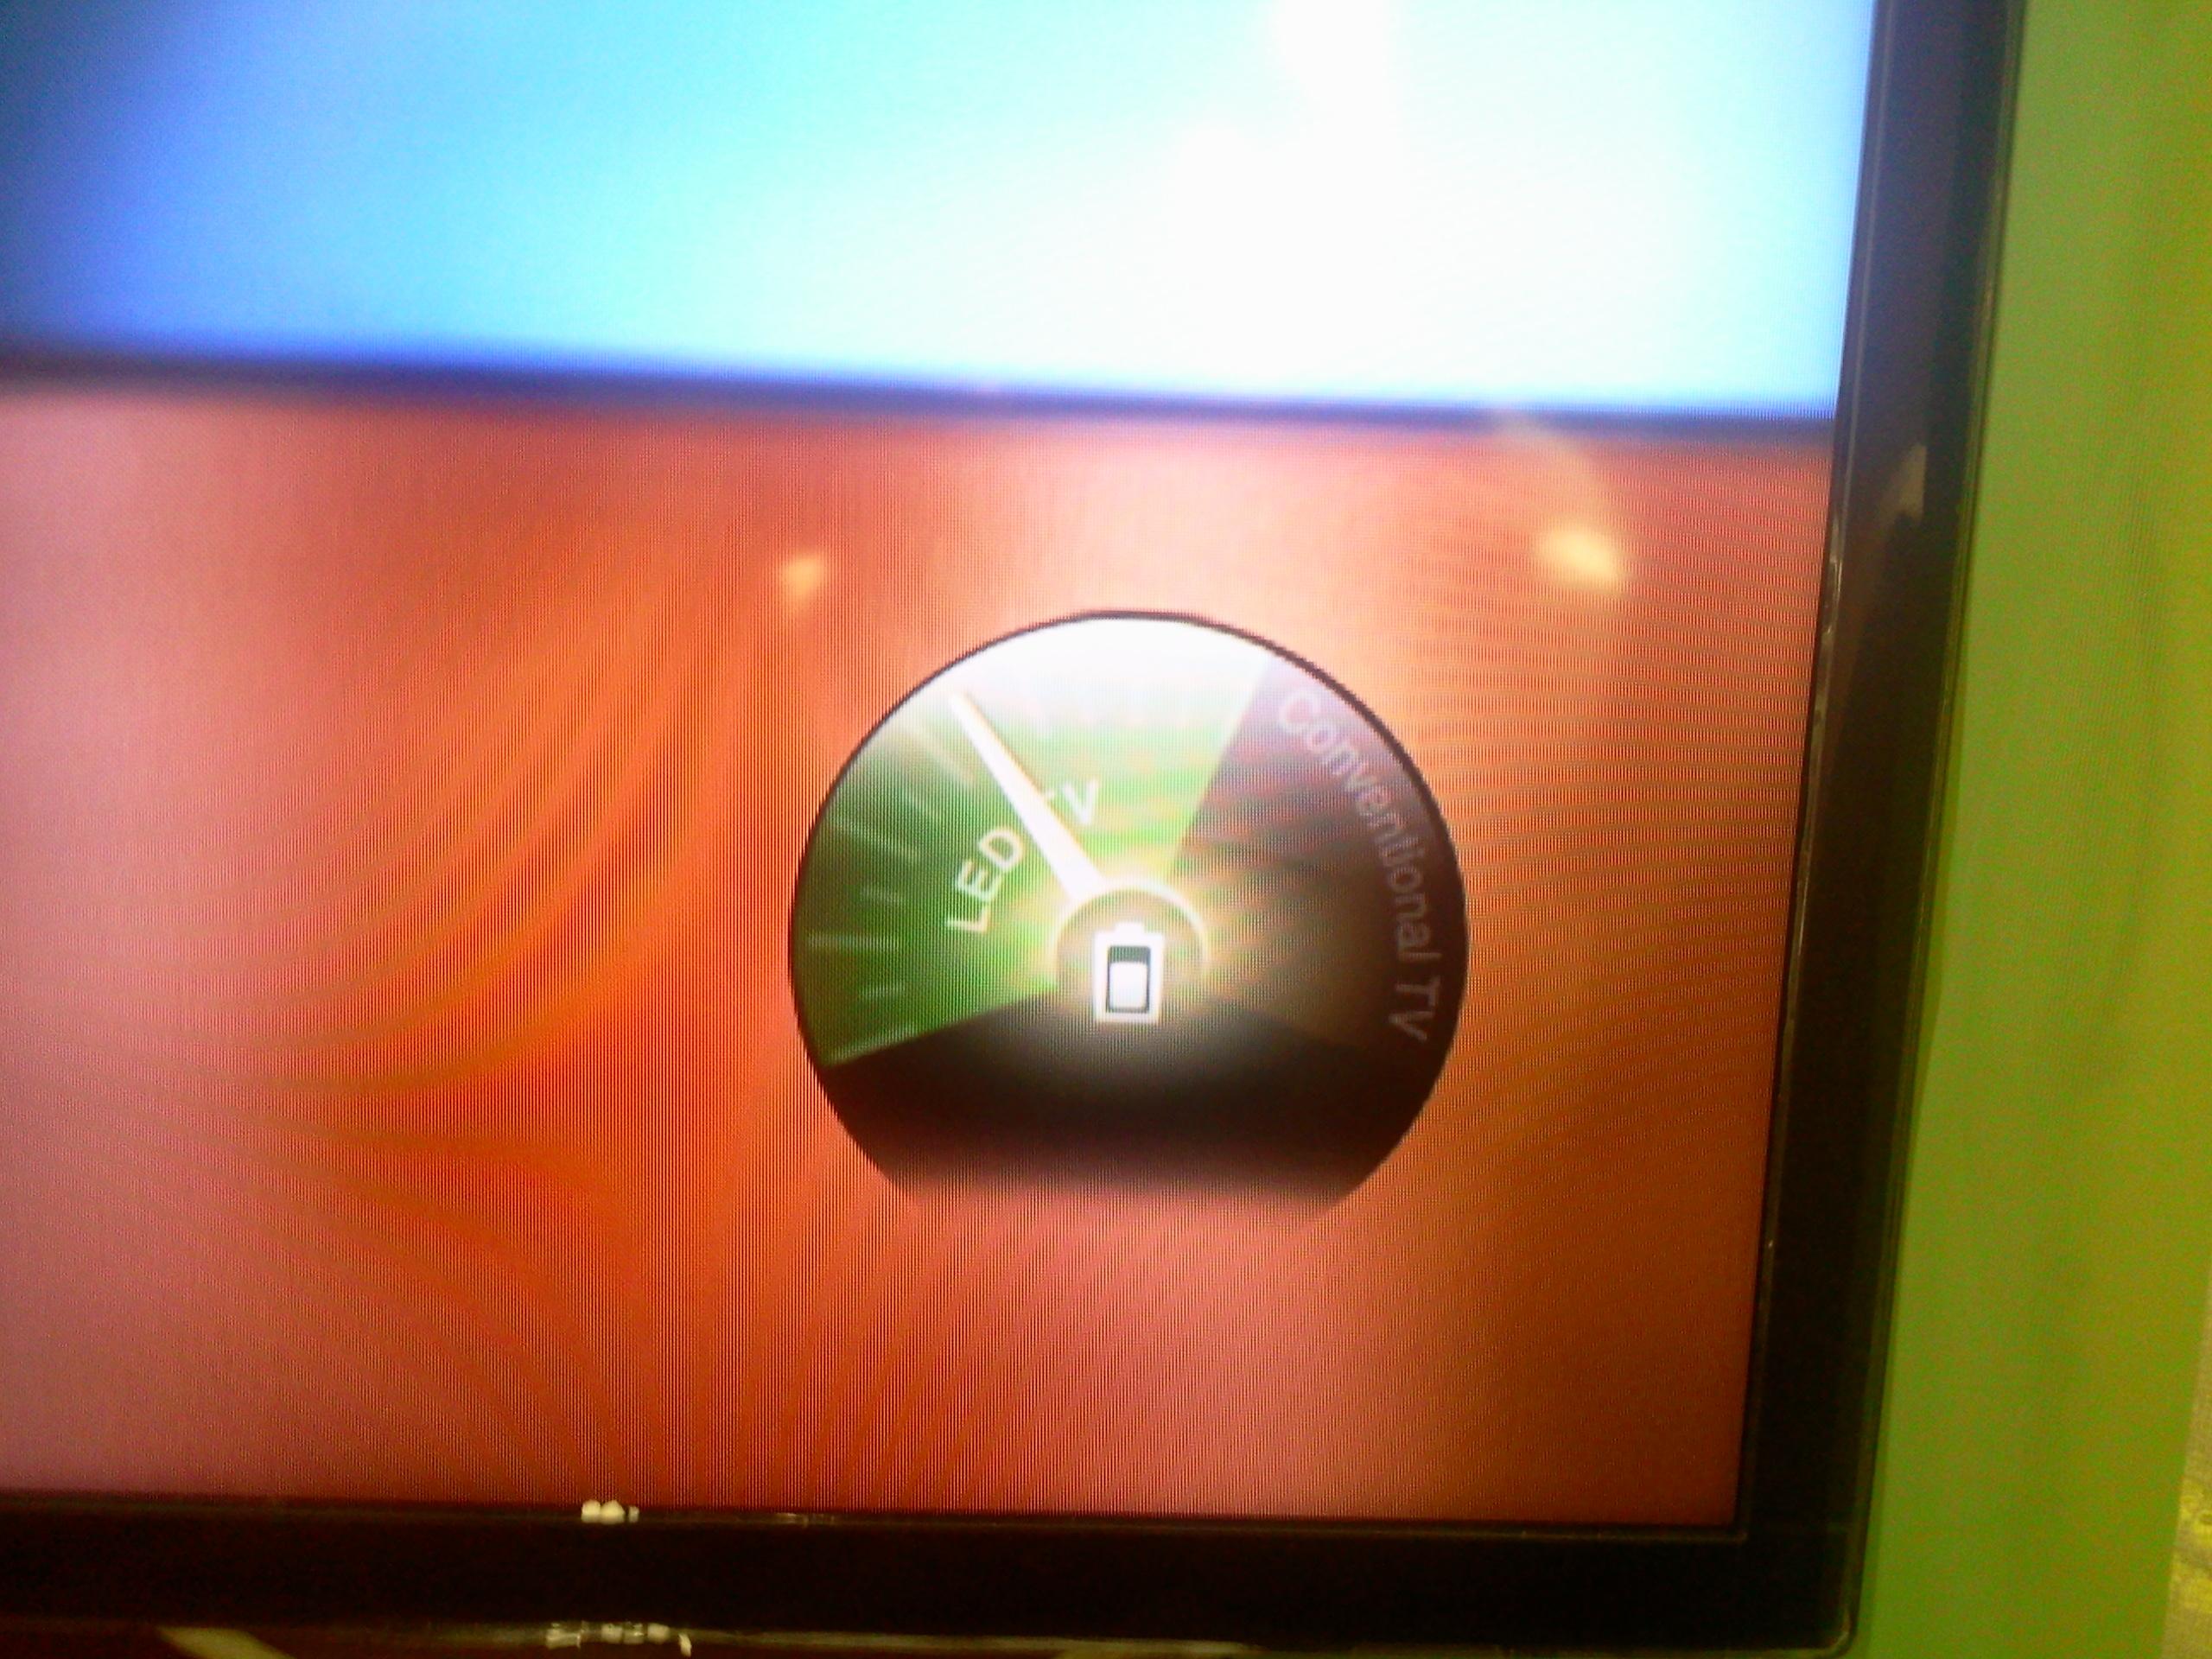 samsung ue40f6400 - Nowy telewizor, co oznacza ten symbol?